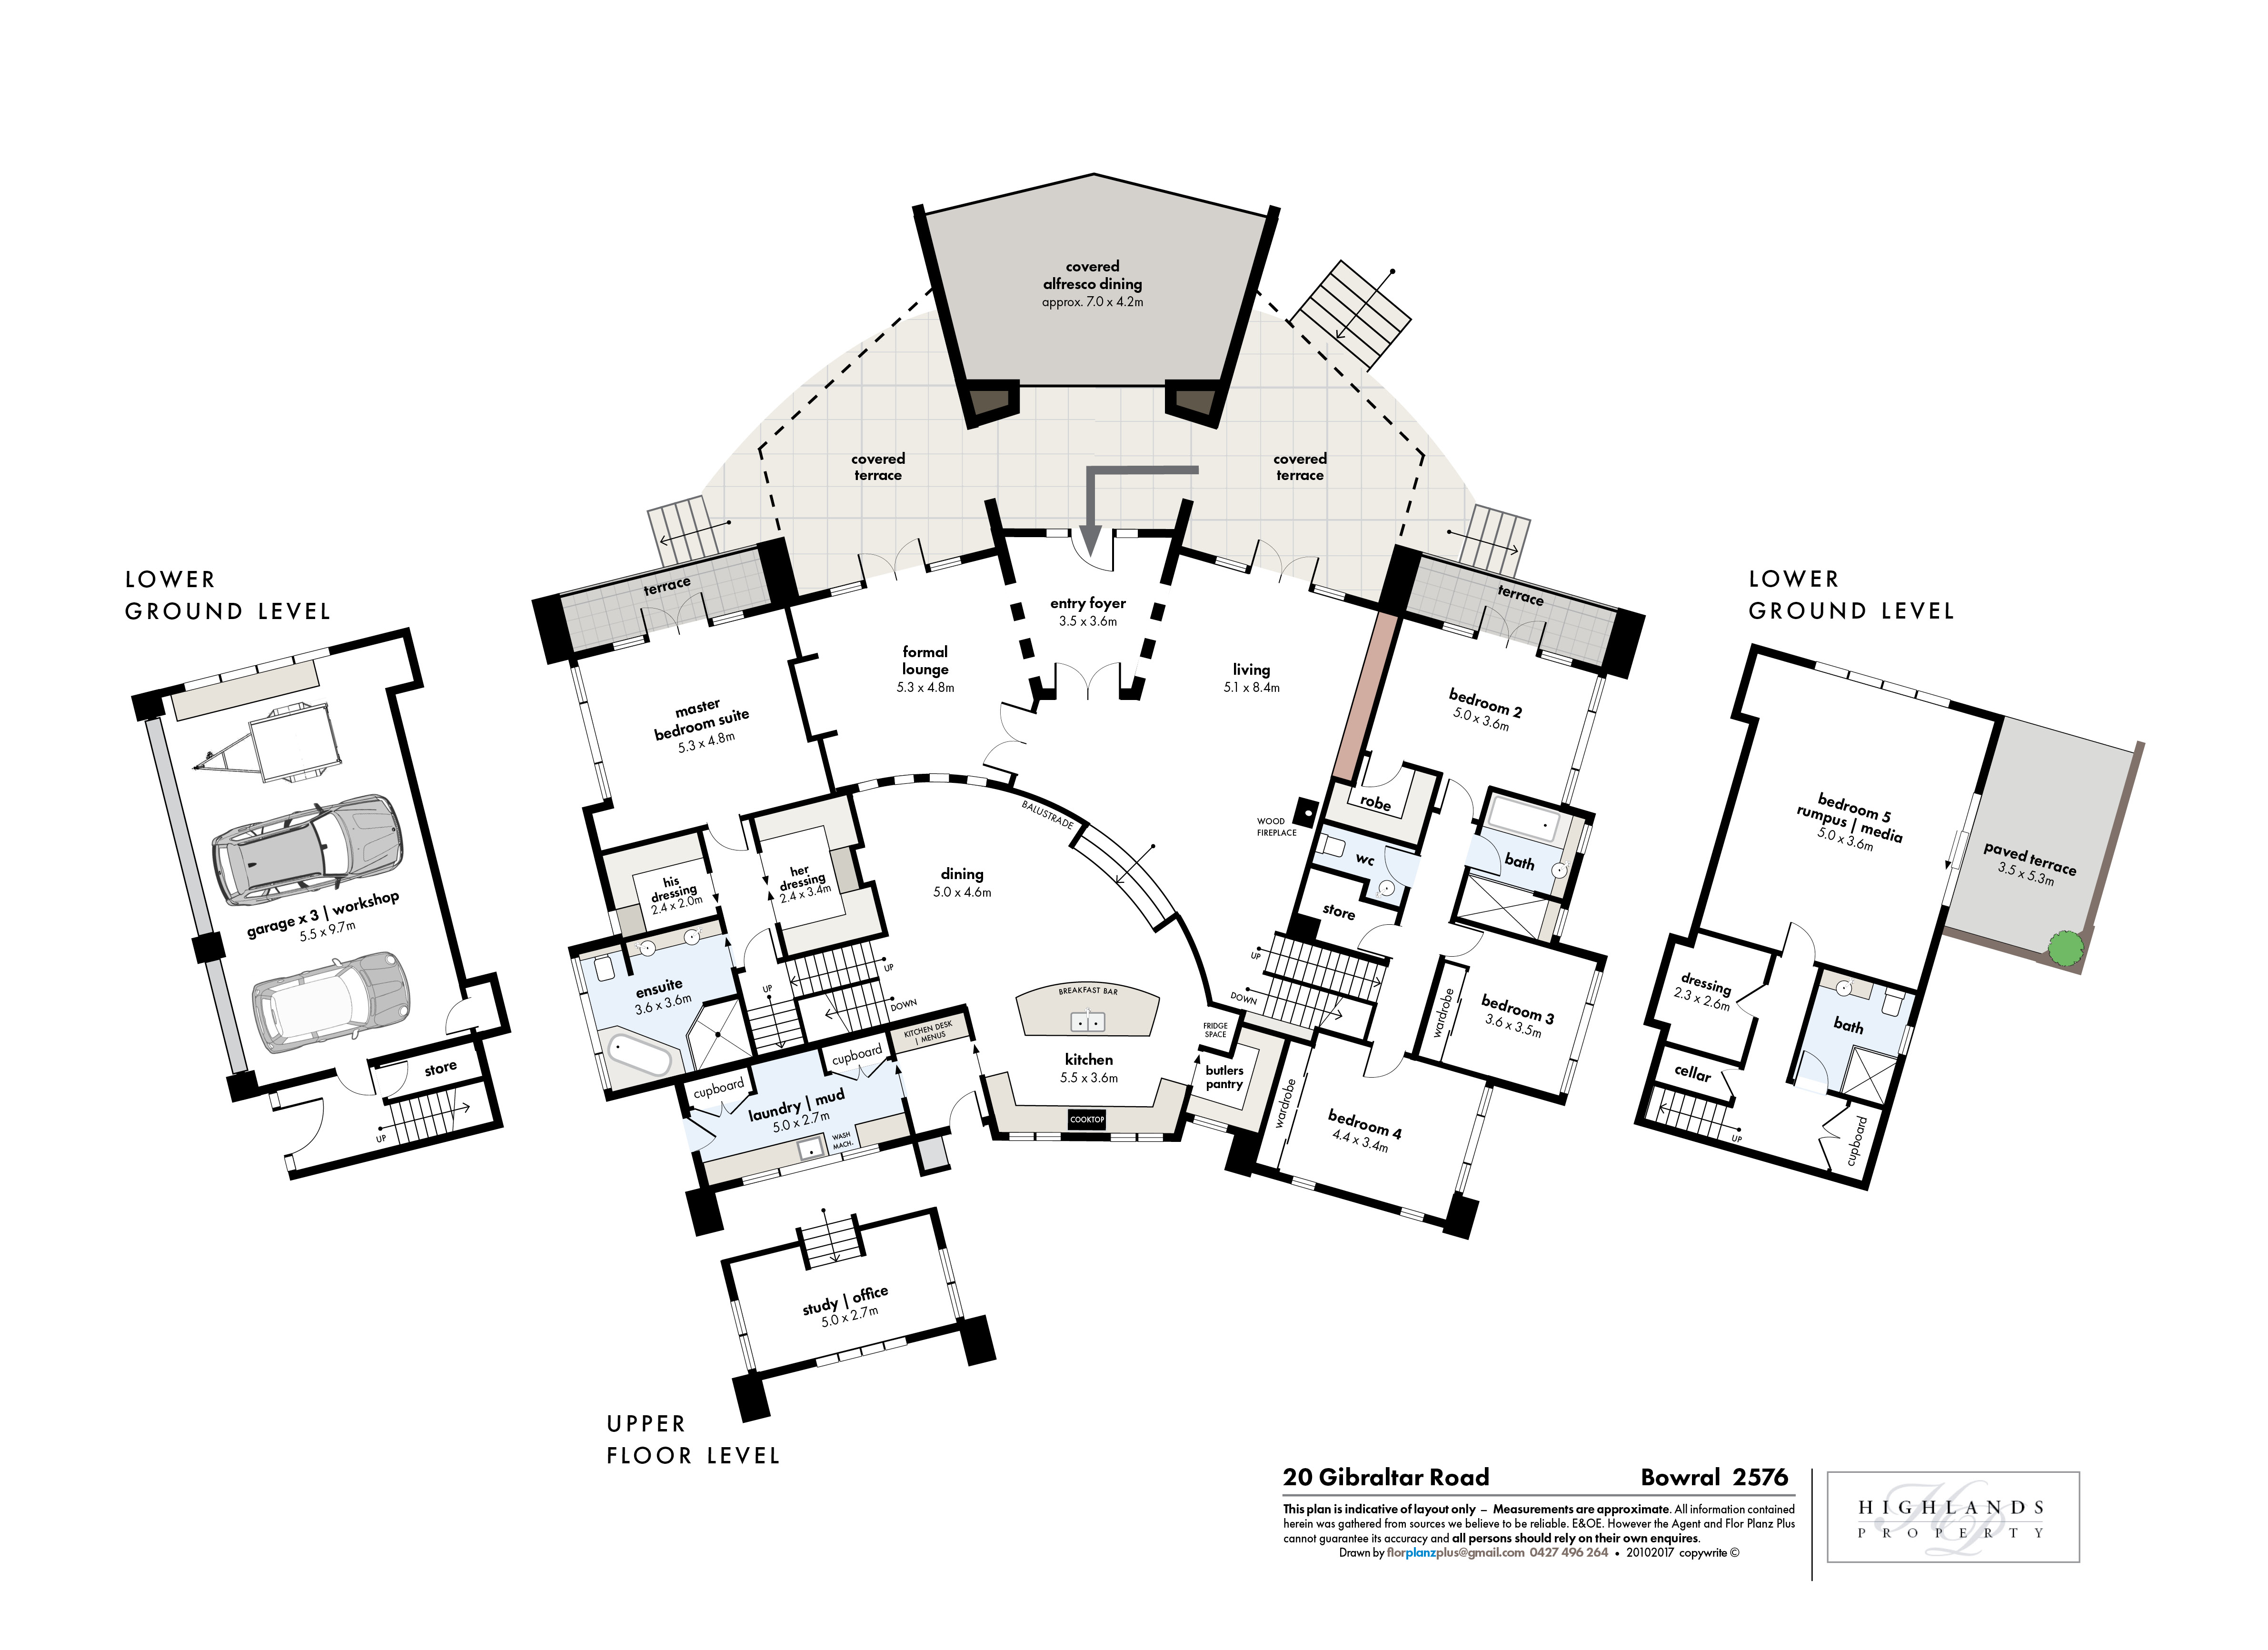 http://assets.boxdice.com.au/highlands/listings/950/21c432b4.jpg